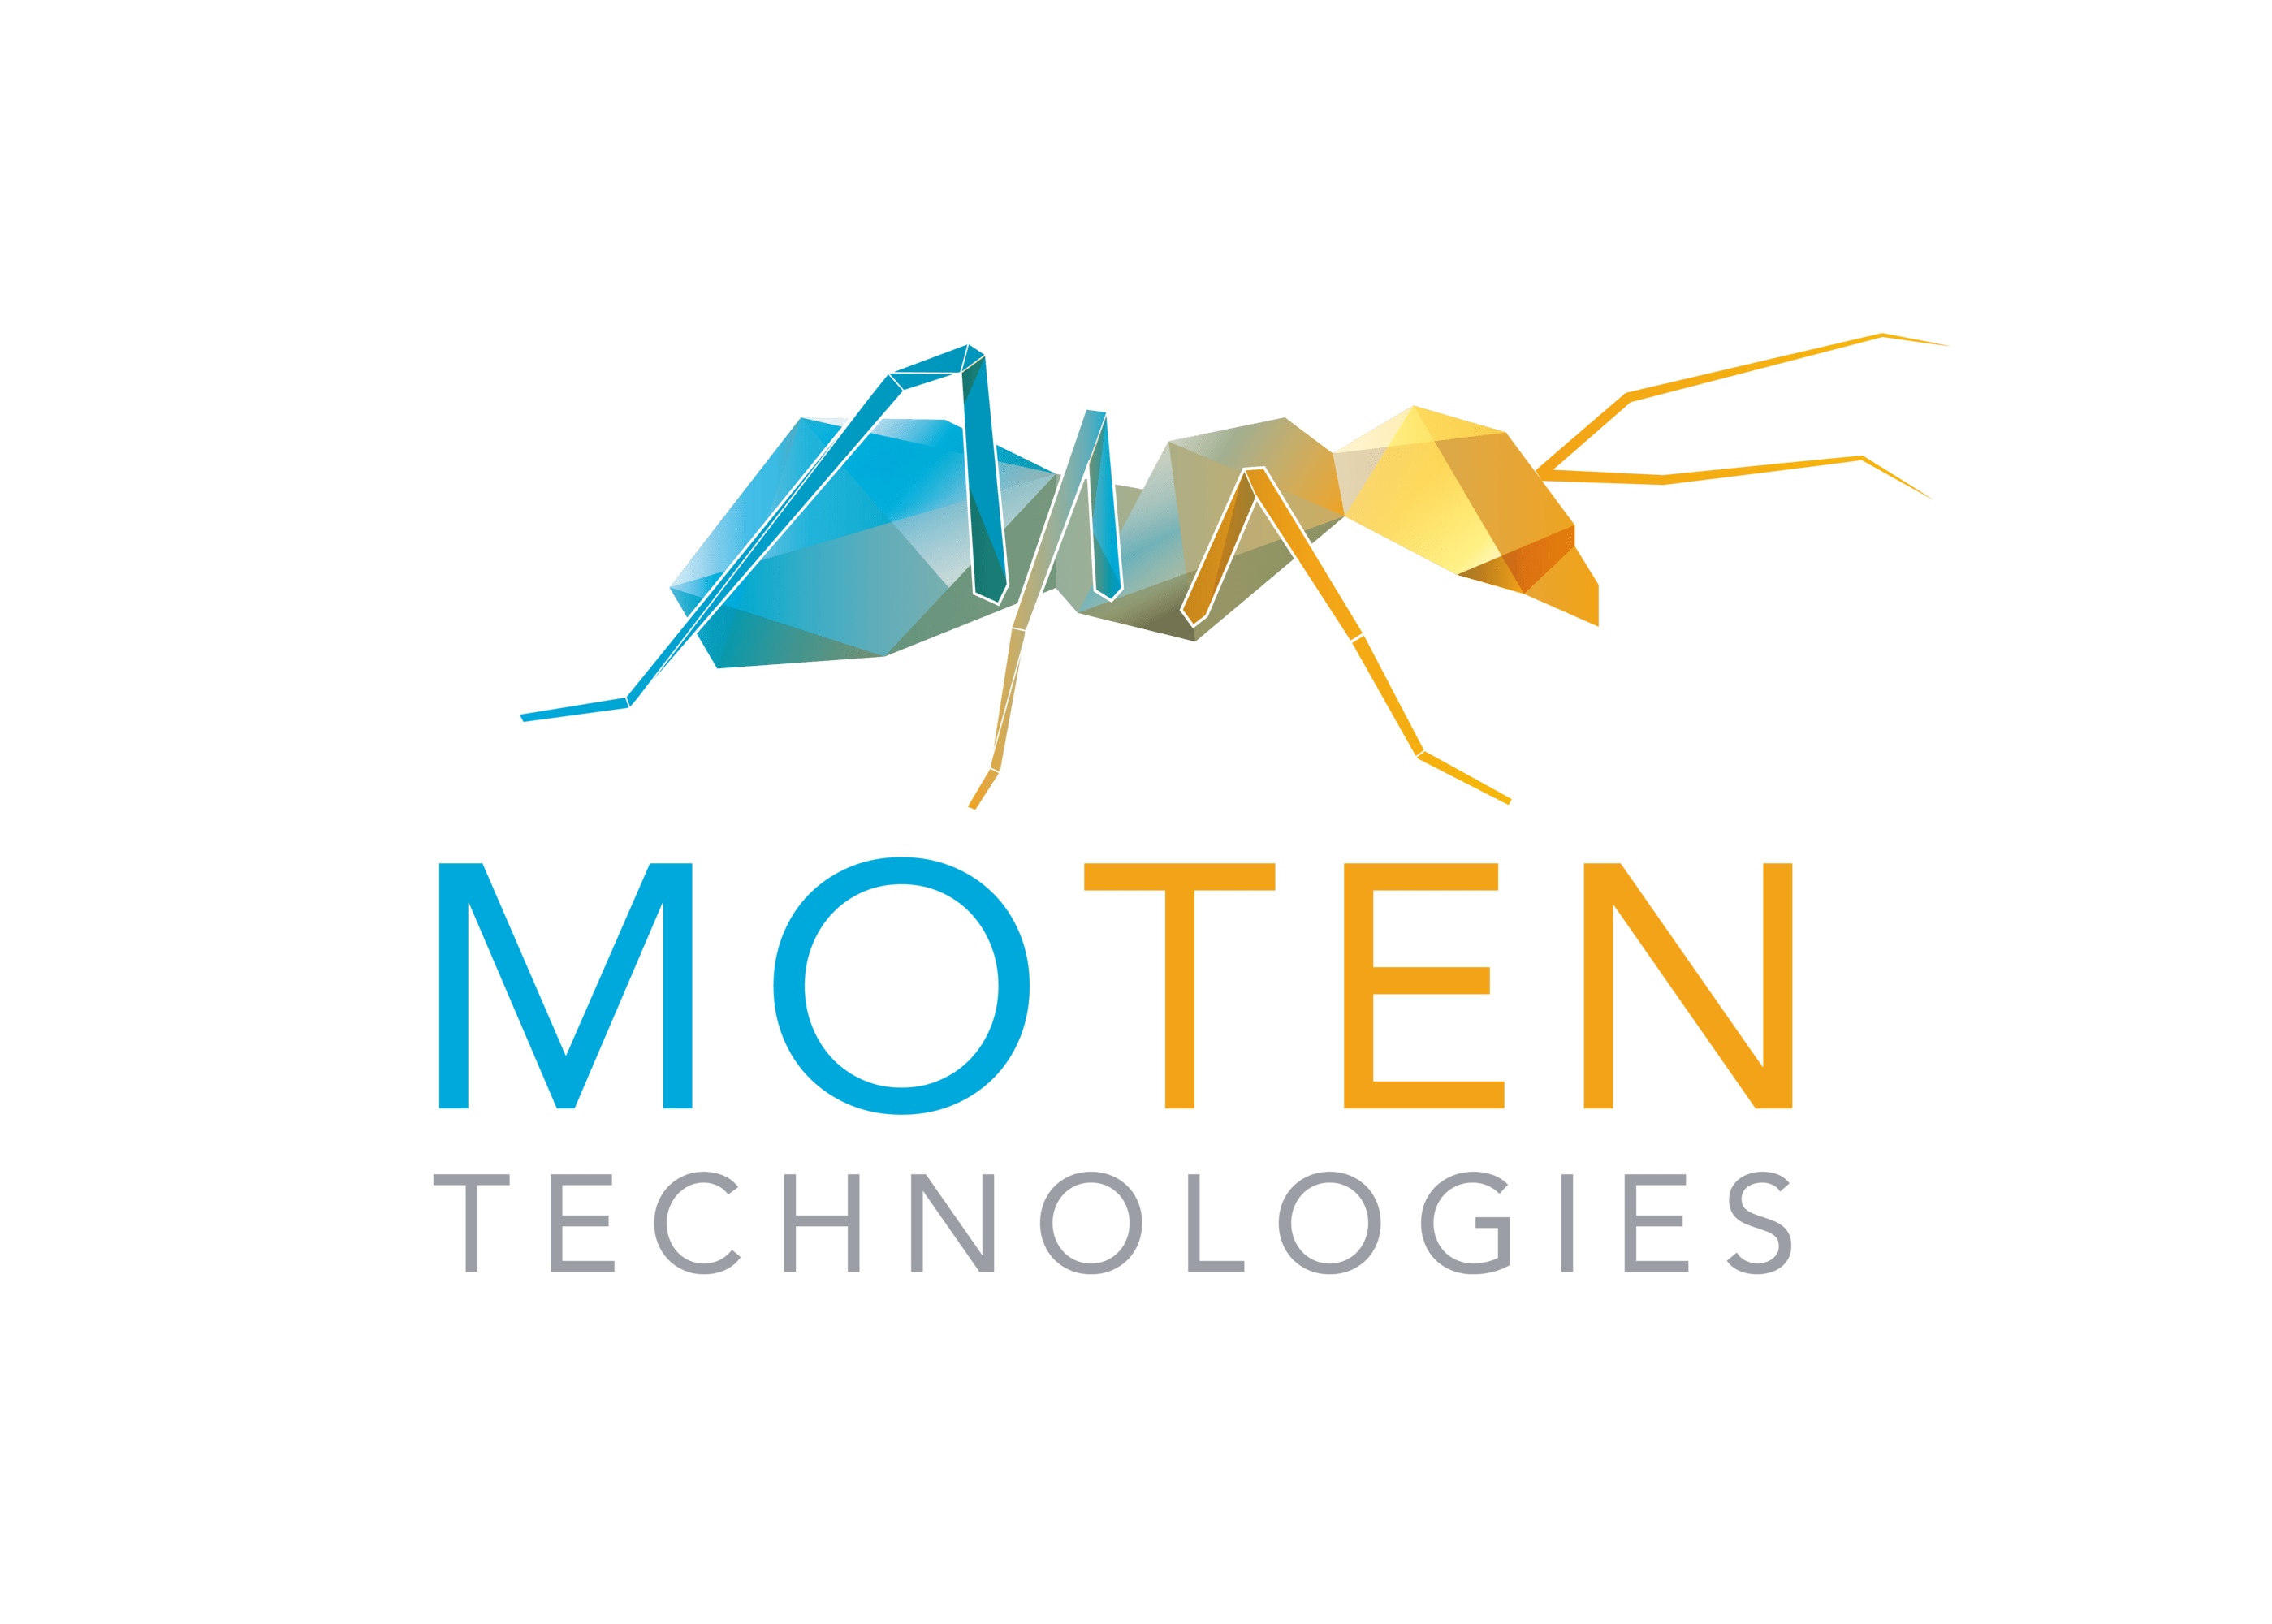 MOTEN TECHNOLOGIES